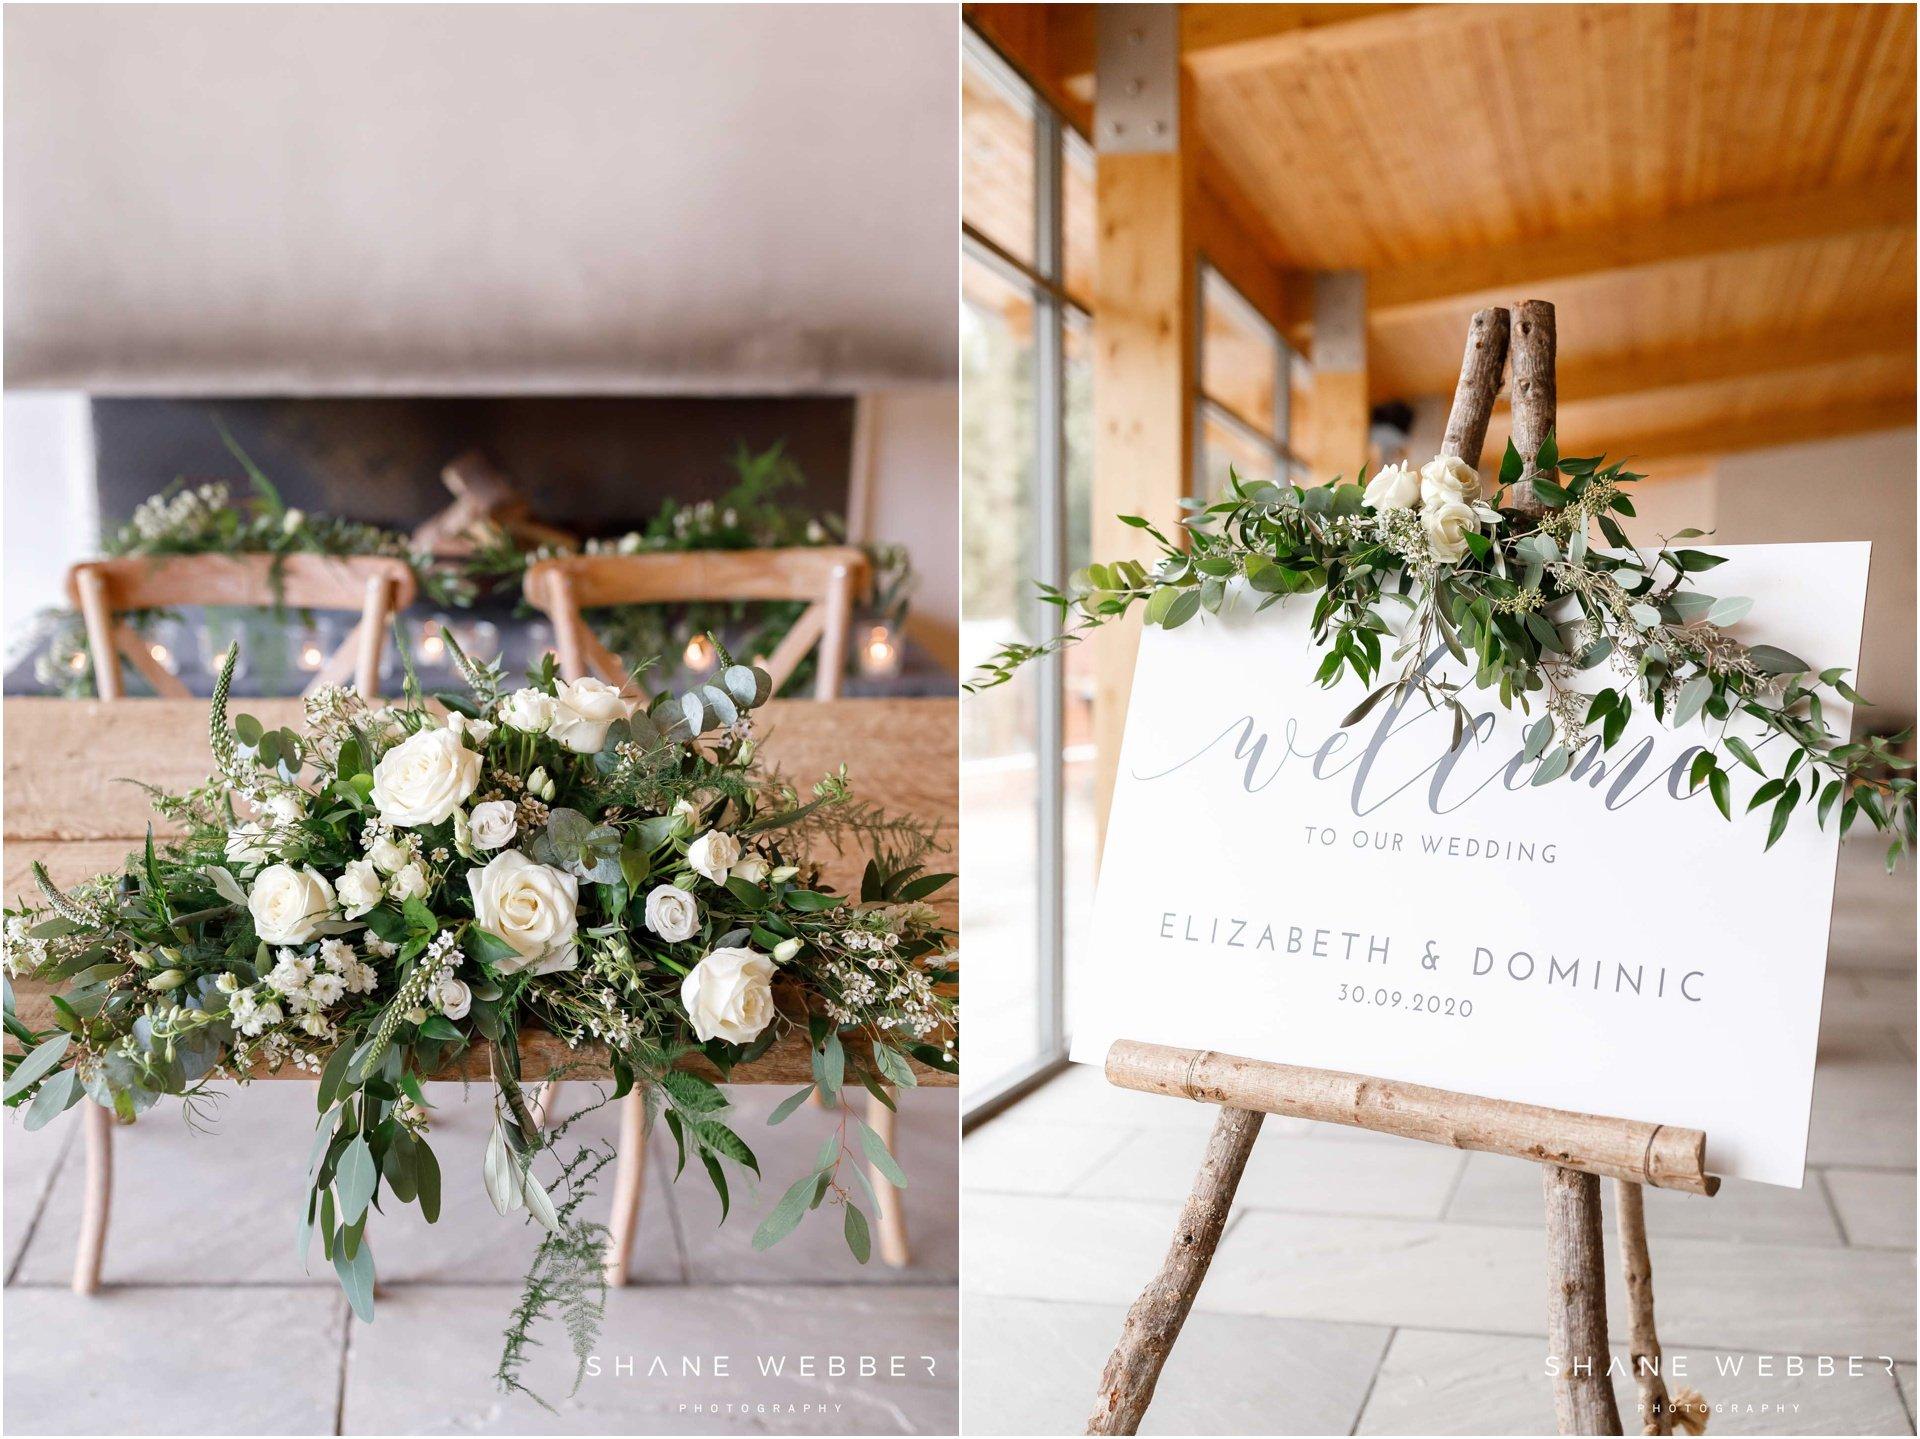 Ivison Lichfield ceremony flowers at Thorpe Gardens